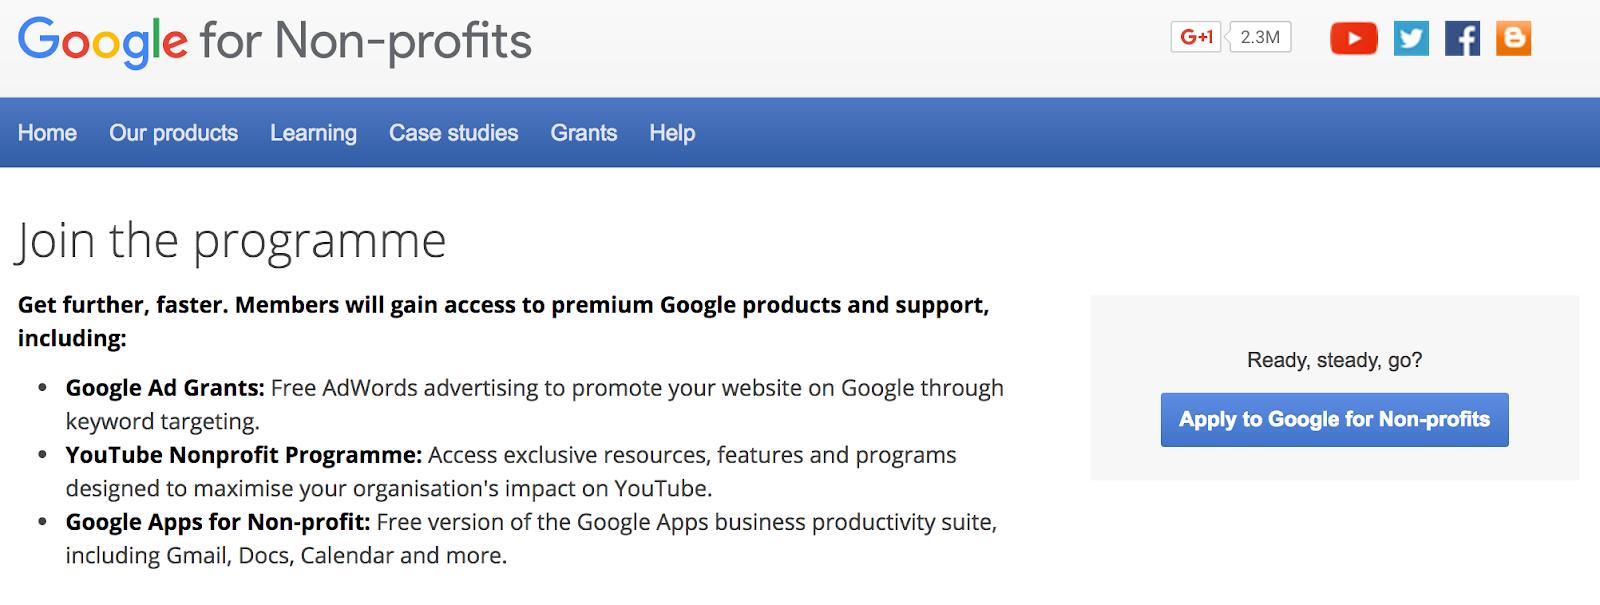 Quick Guide: Google AdWords for Non-profits